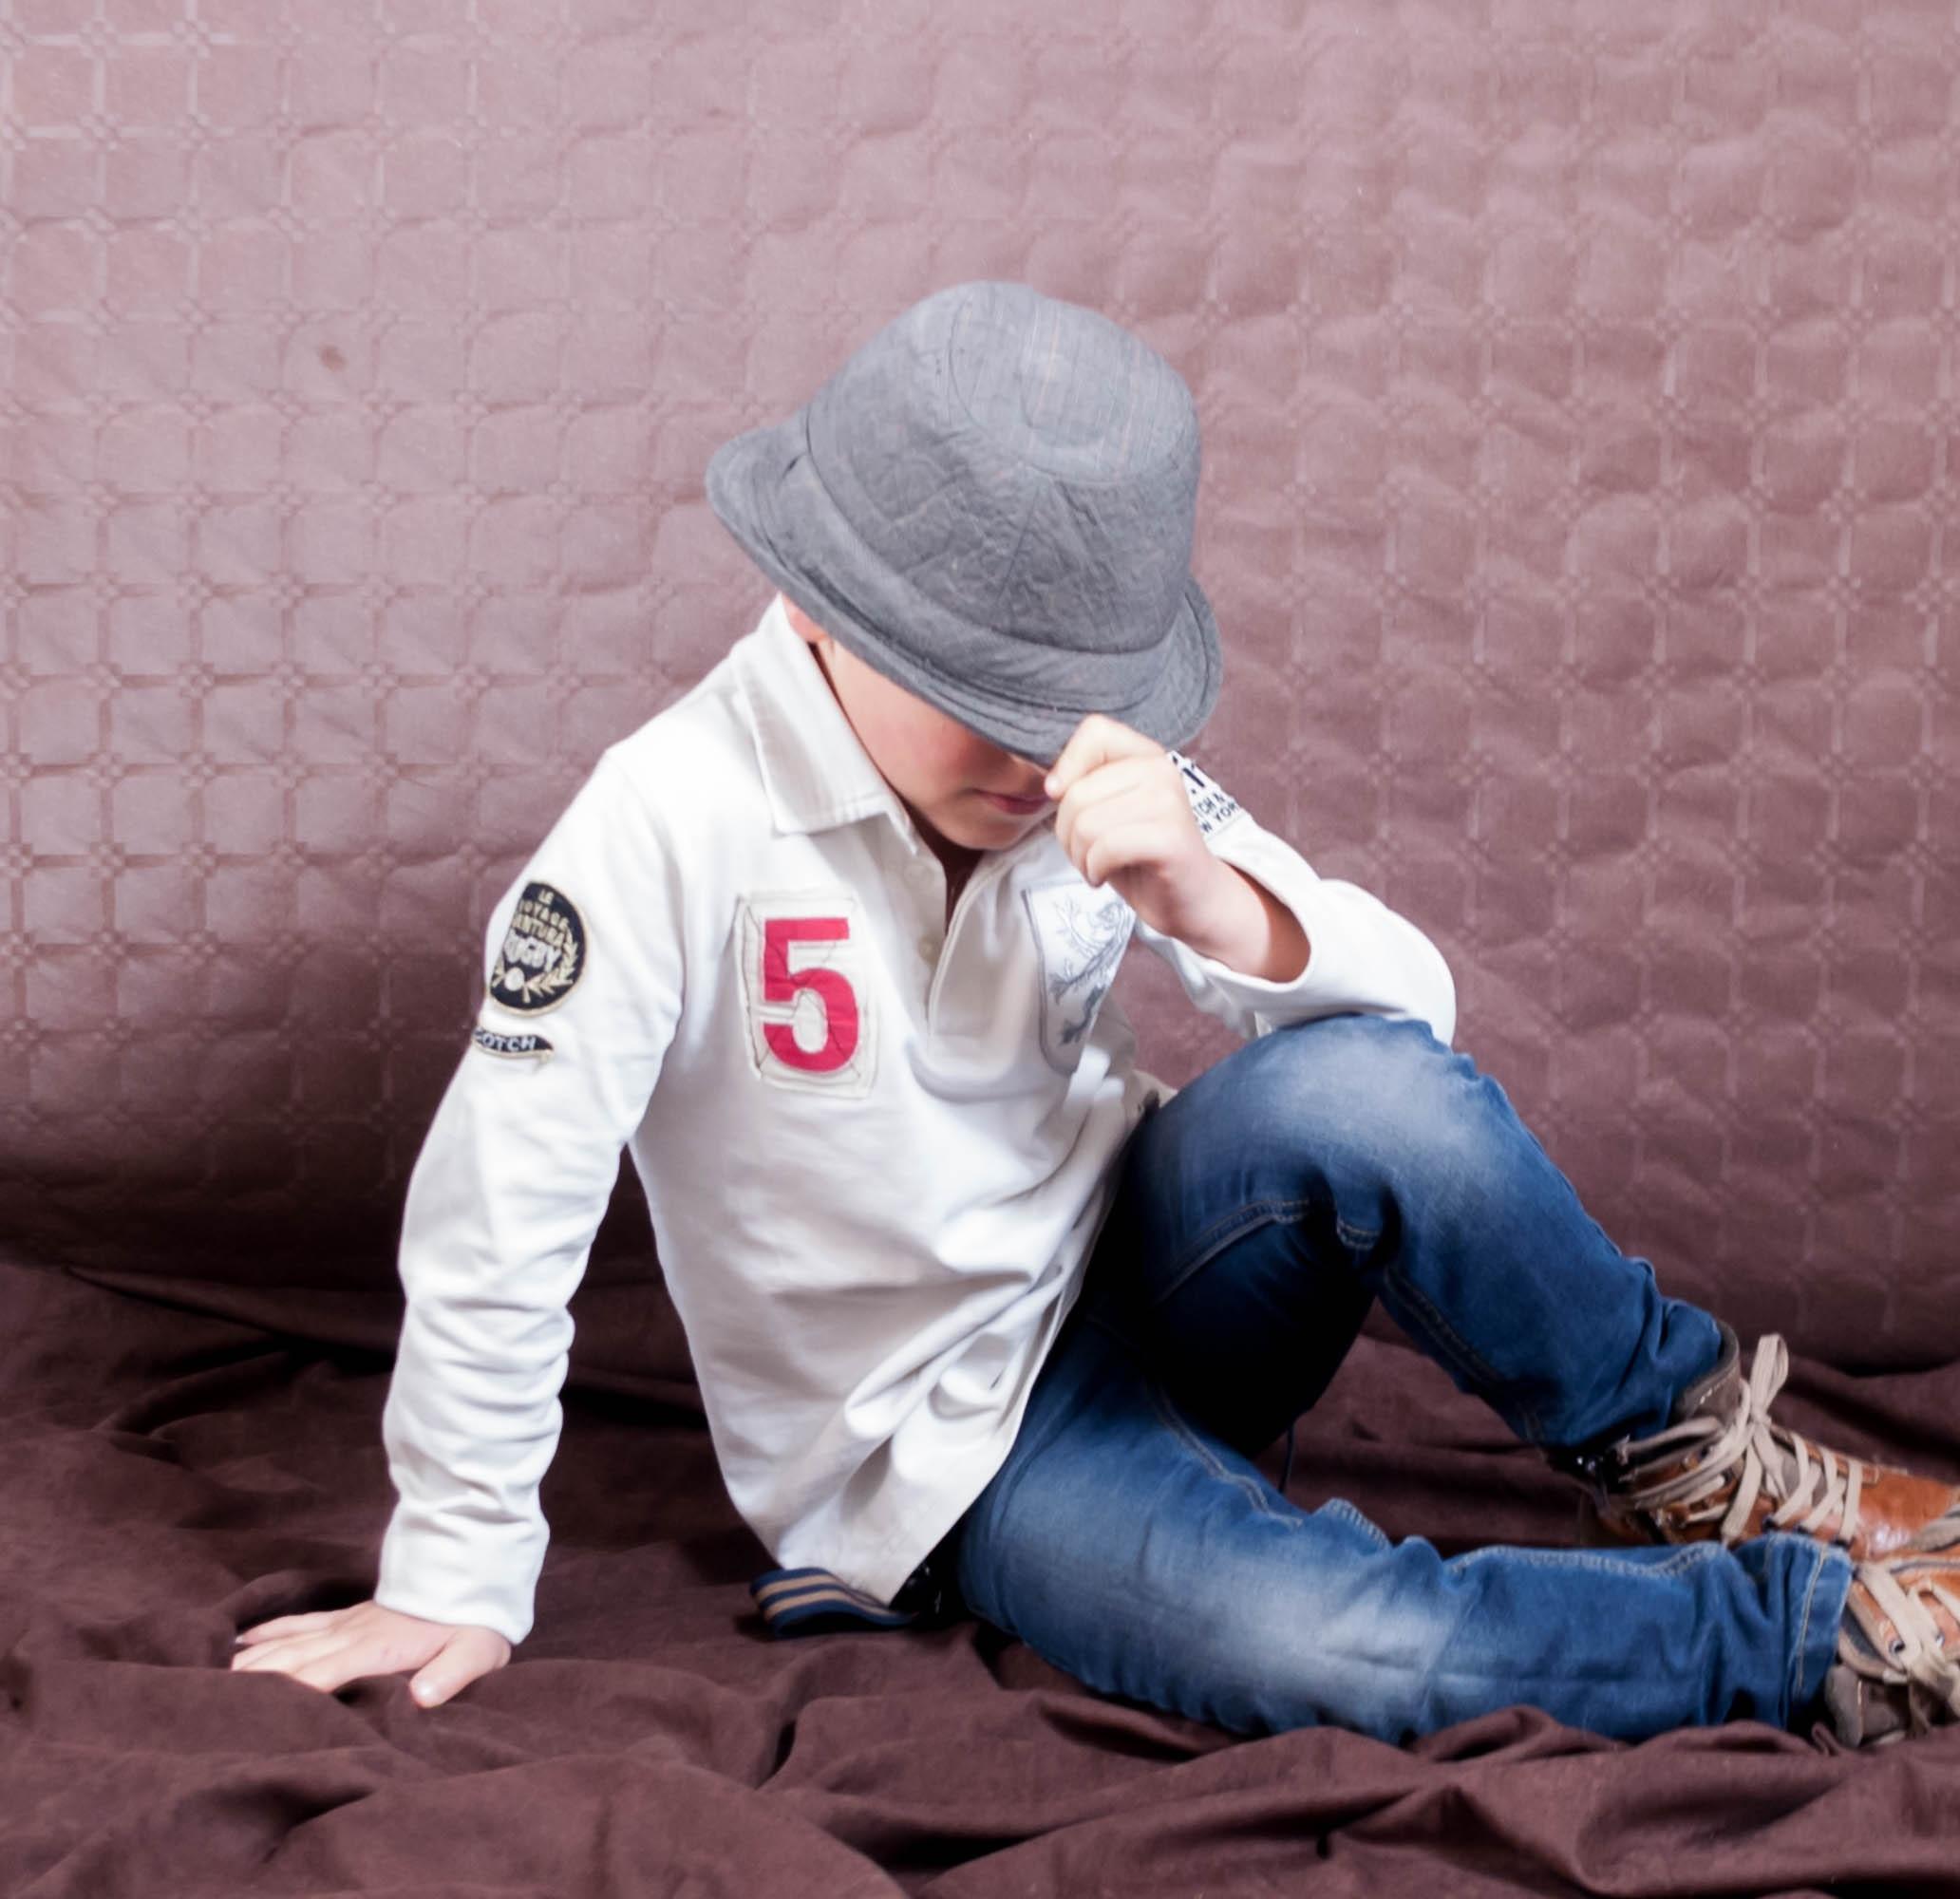 Gambar Orang Anak Laki Laki Pria Duduk Biru Topi Anak Kecil